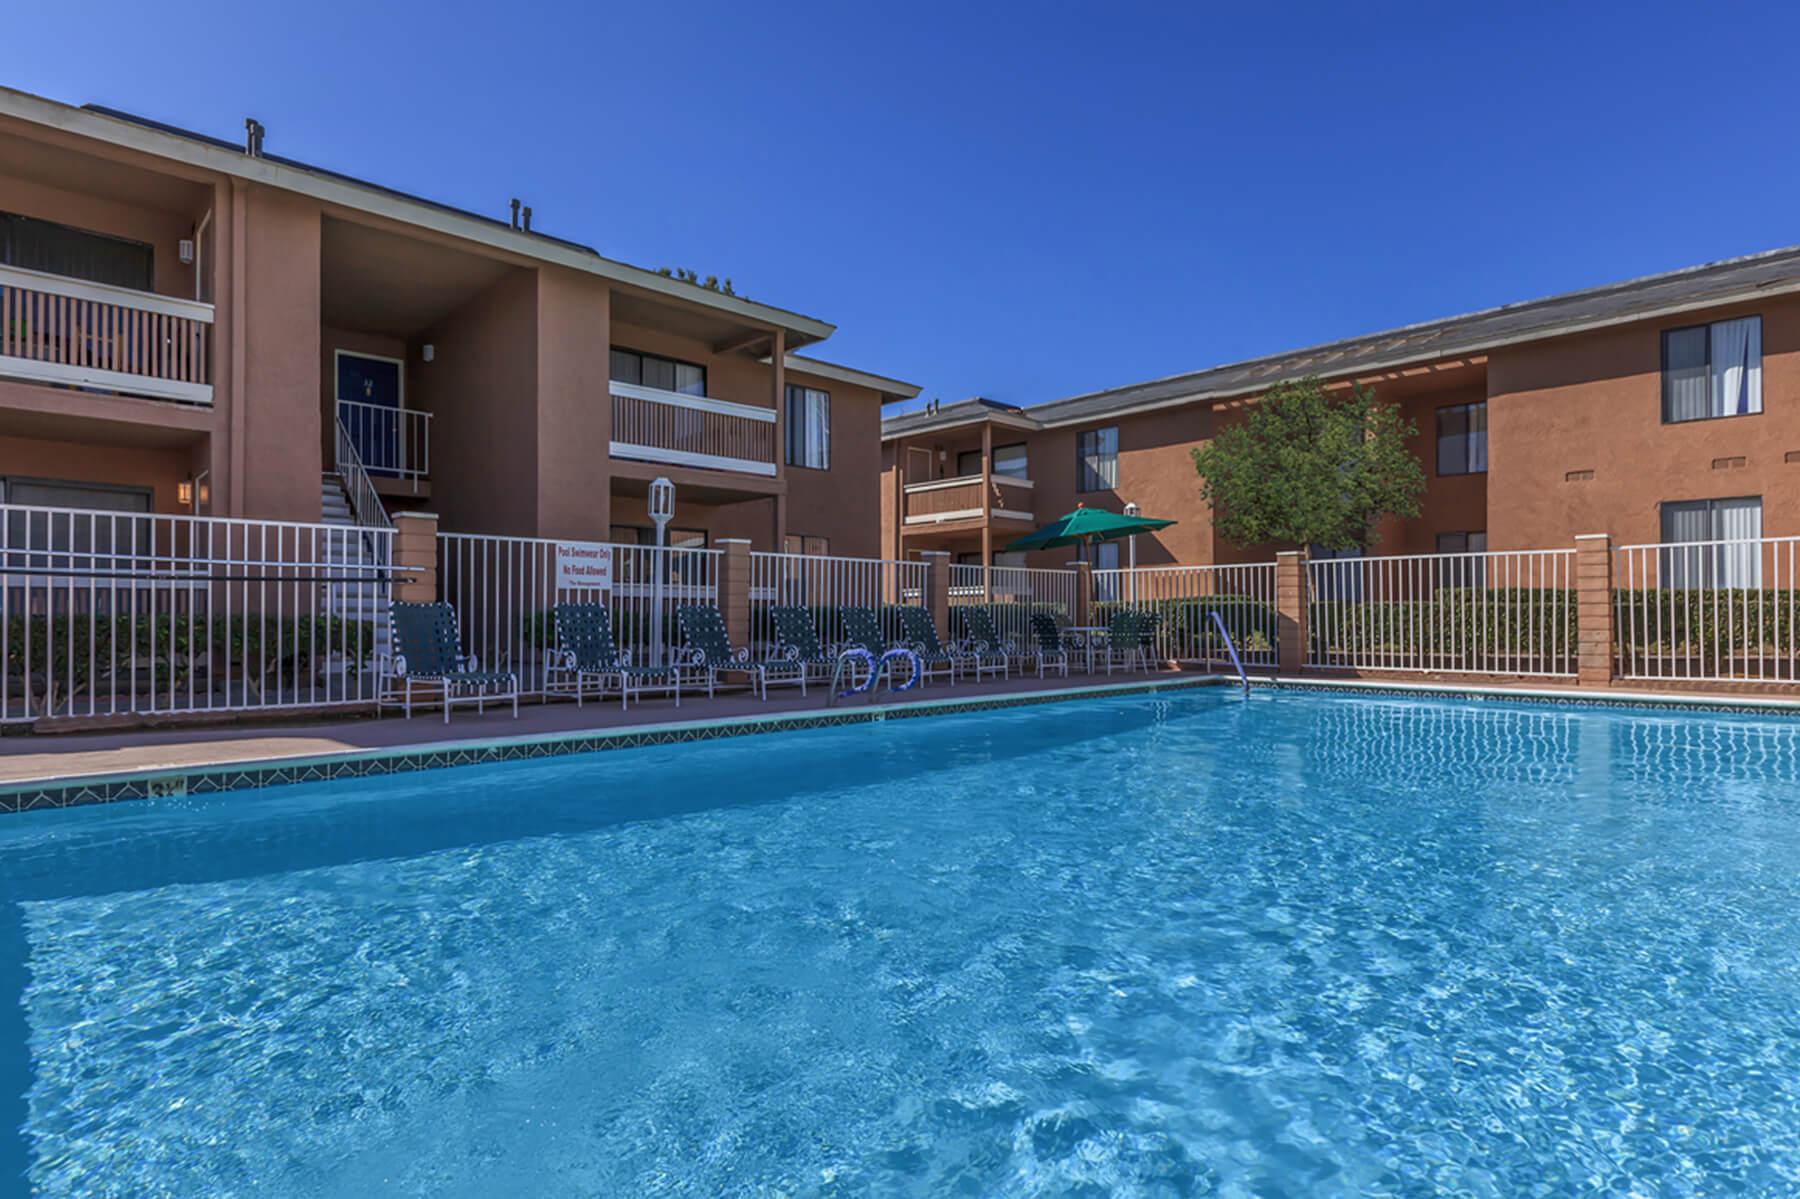 Carmel Apartments - Ebrochure